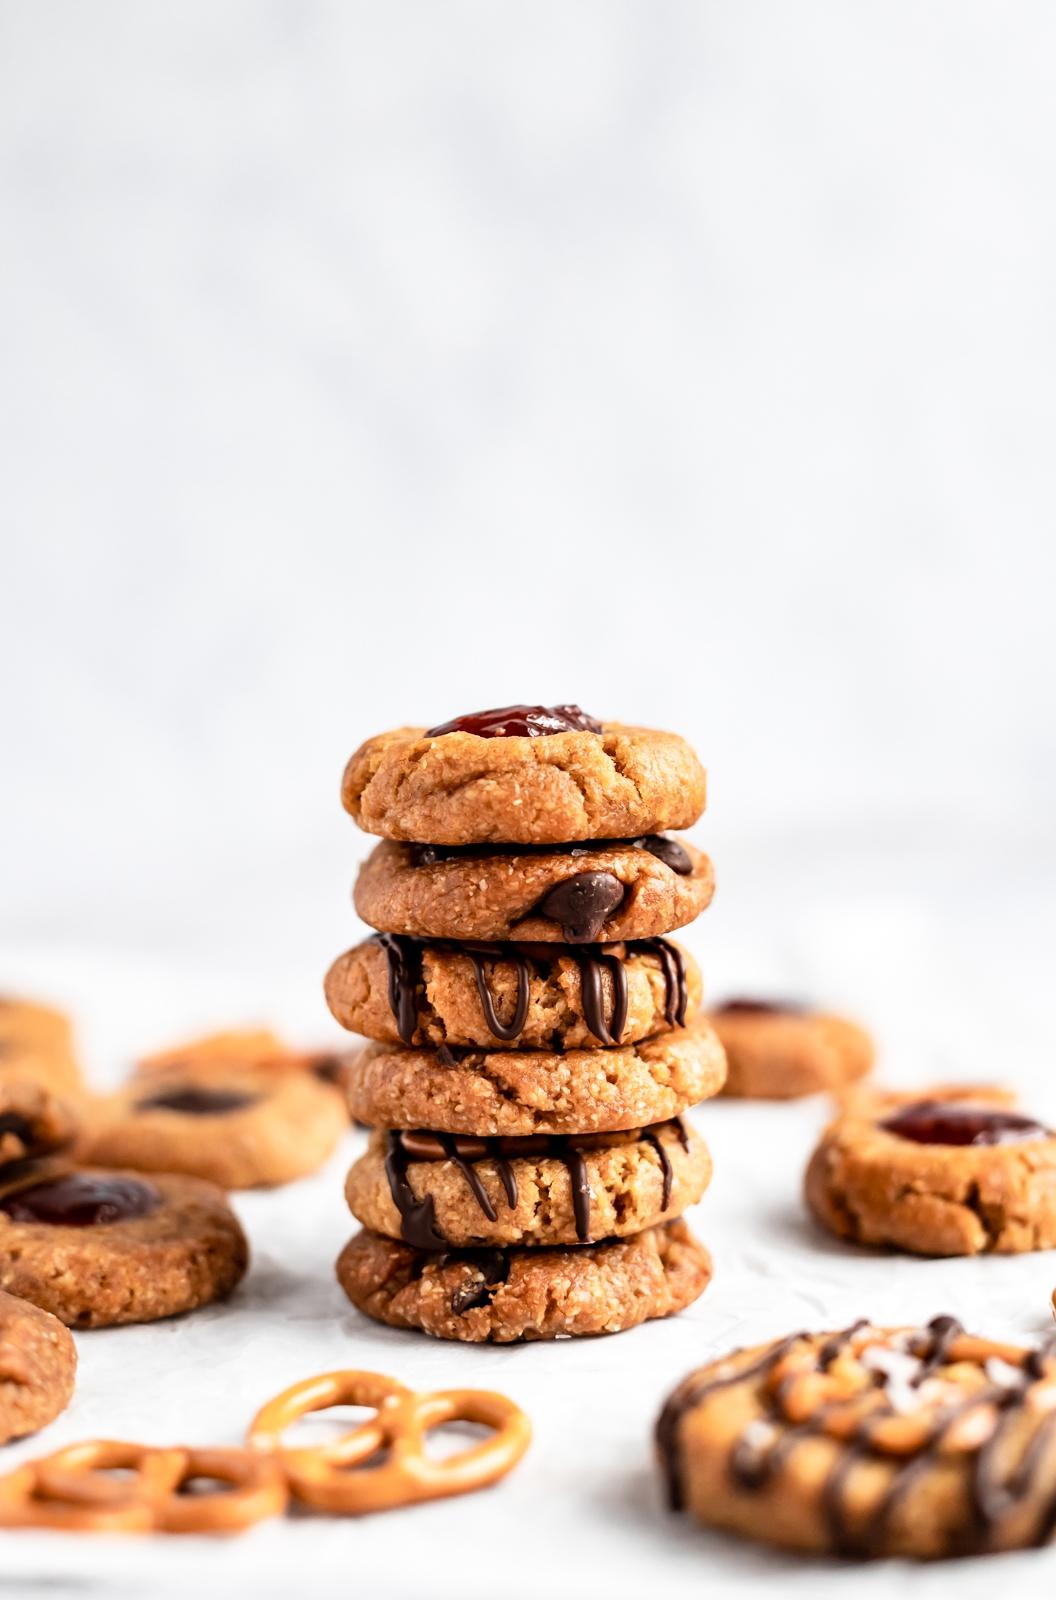 vegan peanut butter cookies stacked